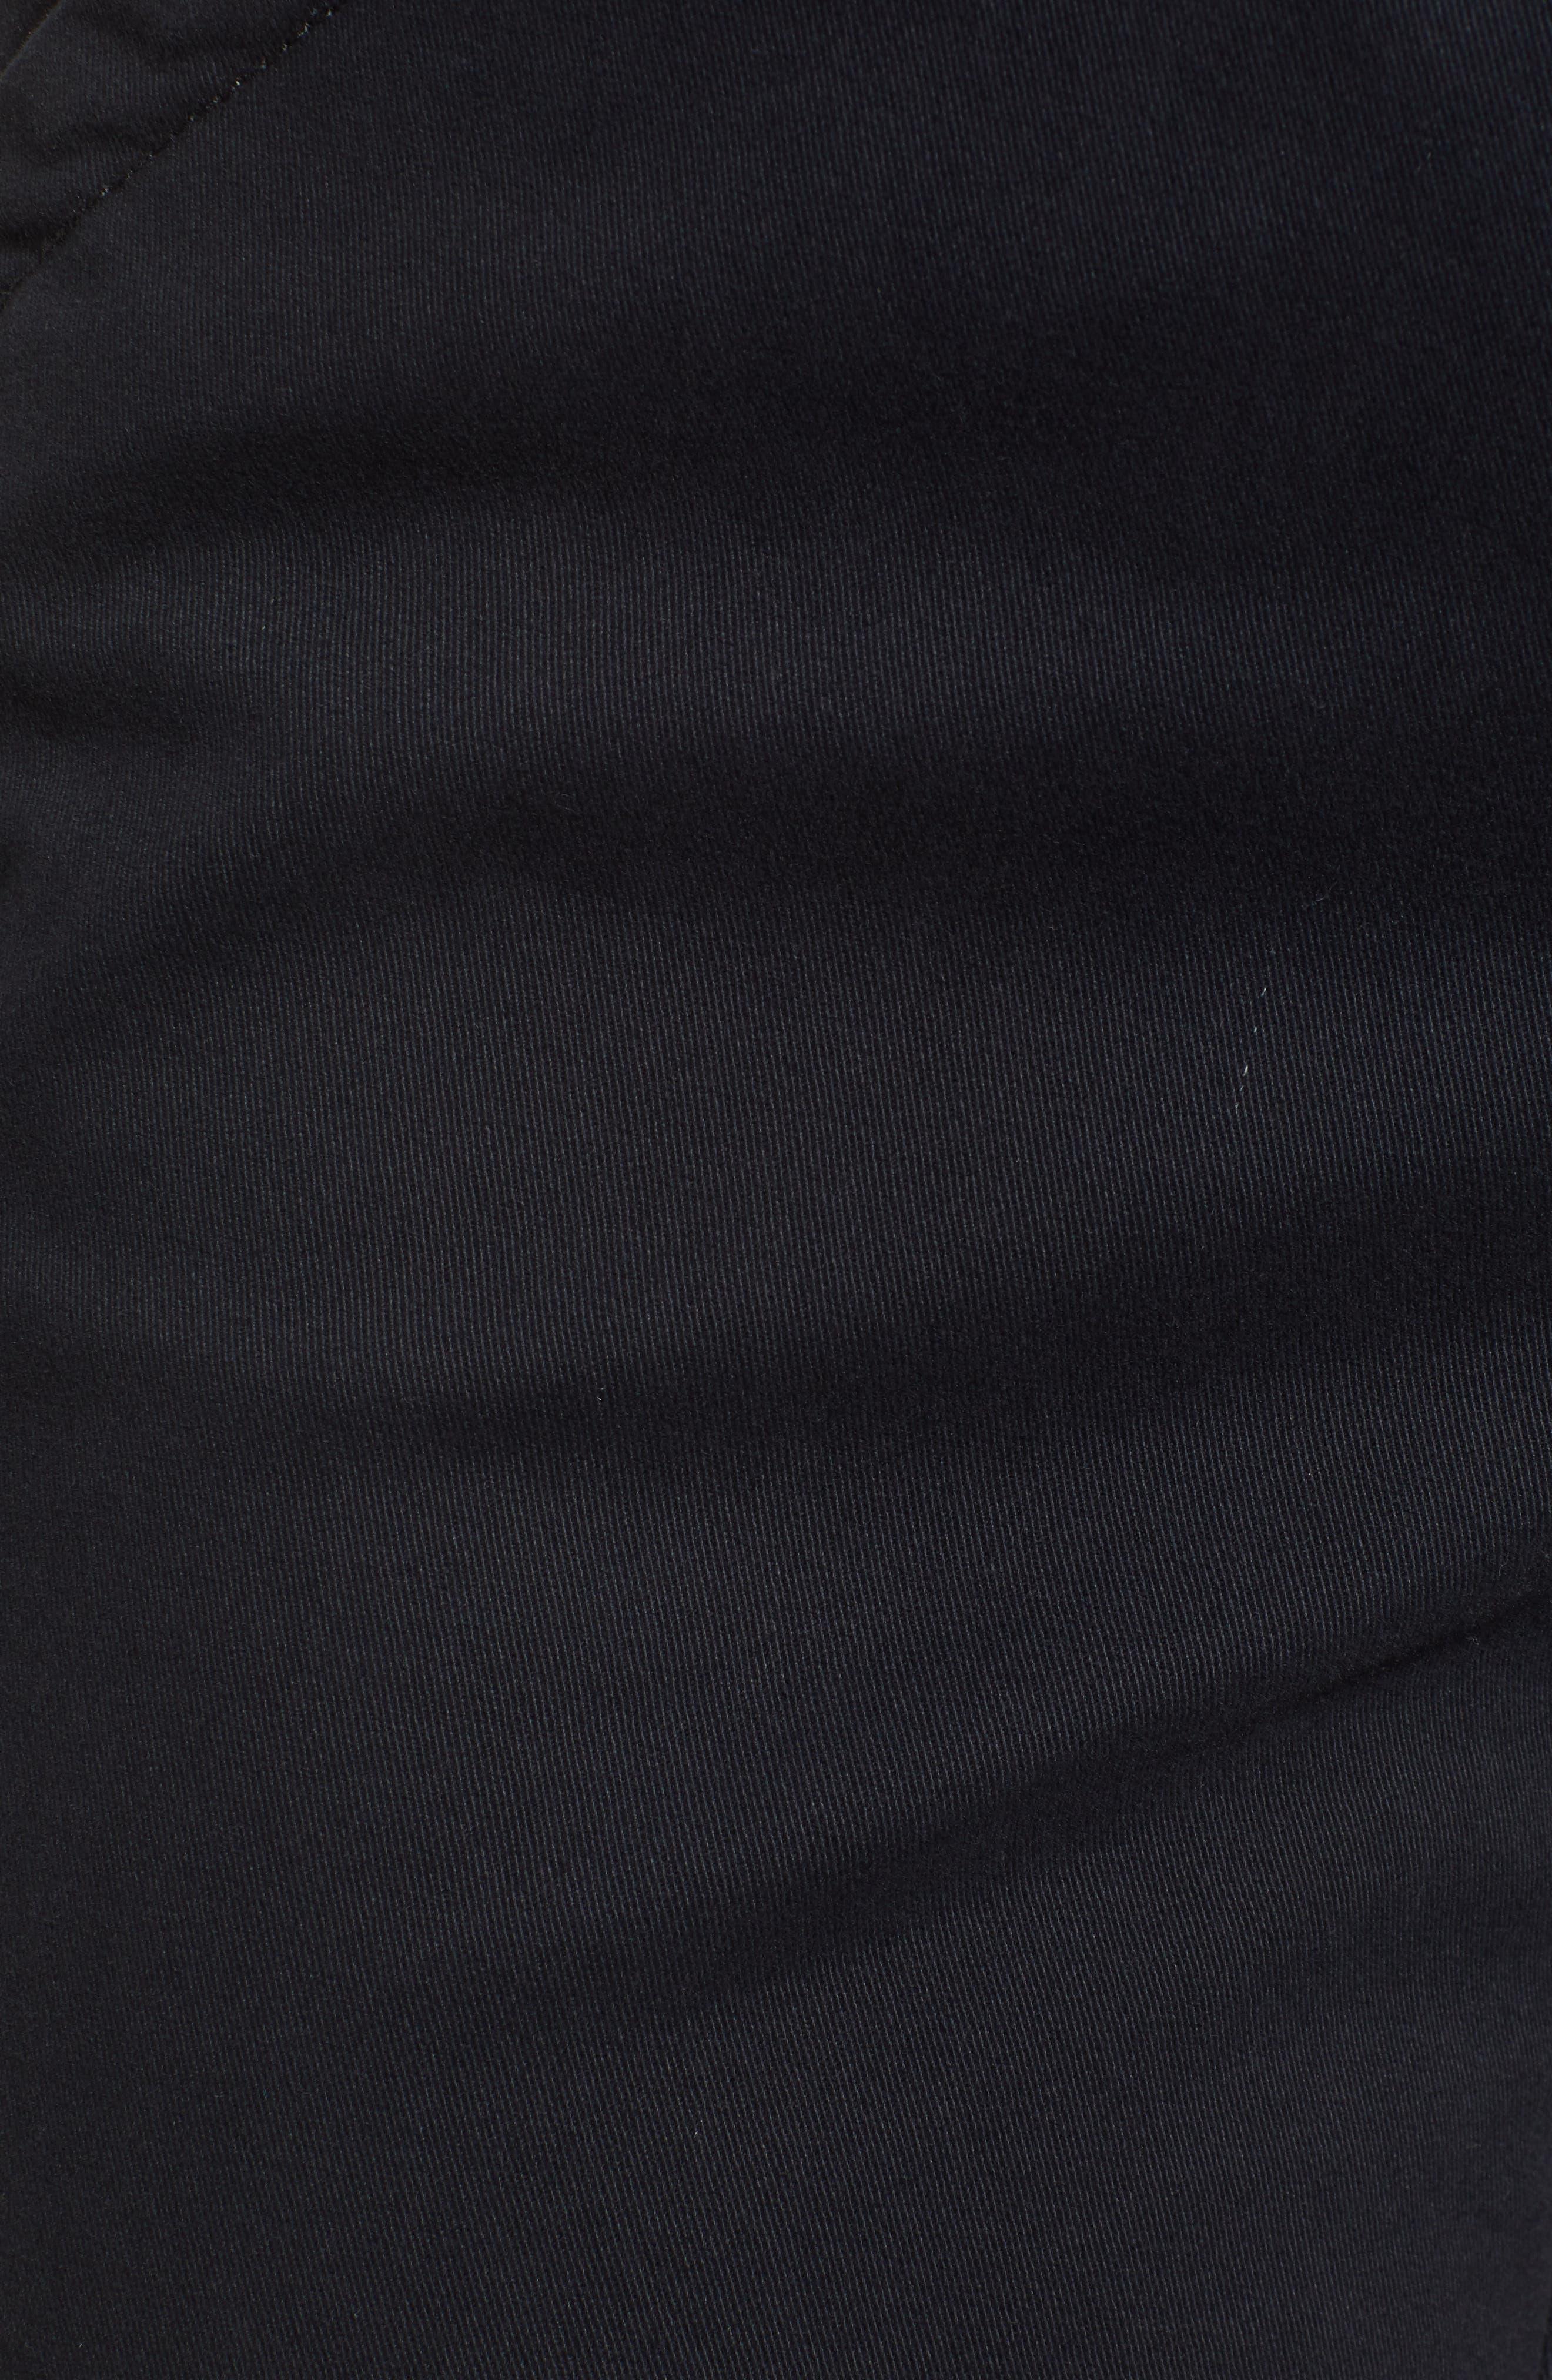 Gracie Bermuda Shorts,                             Alternate thumbnail 6, color,                             BLACK